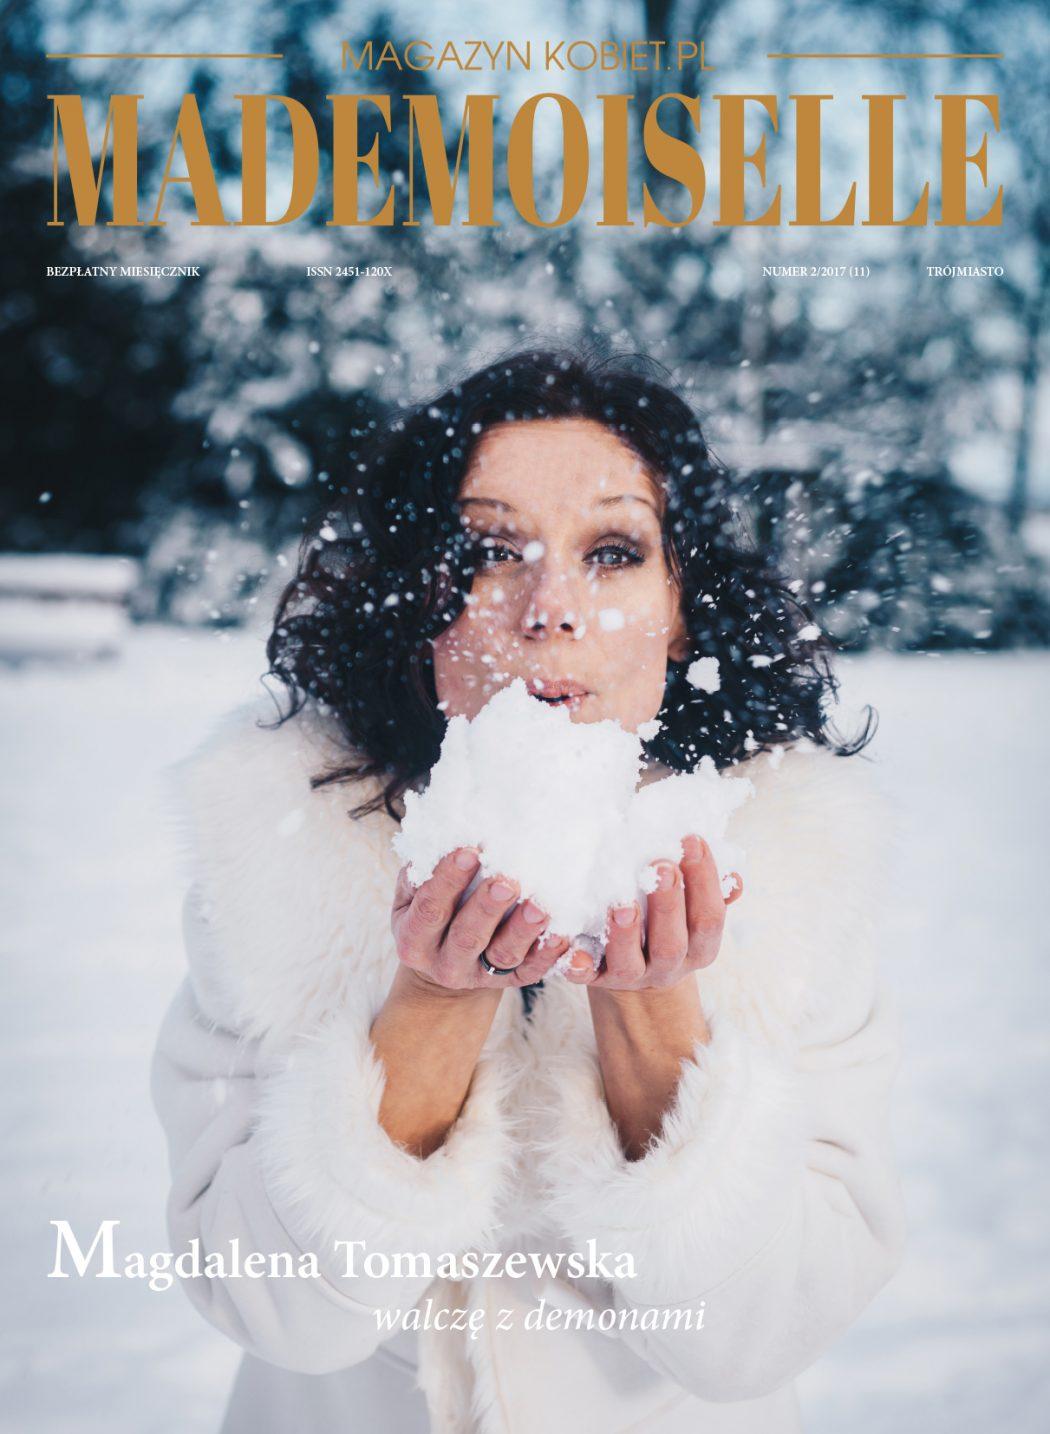 magazynkobiet.pl - mademoiselle okladka 1050x1434 - MAGAZYN KOBIET - Mademoiselle 2/2017